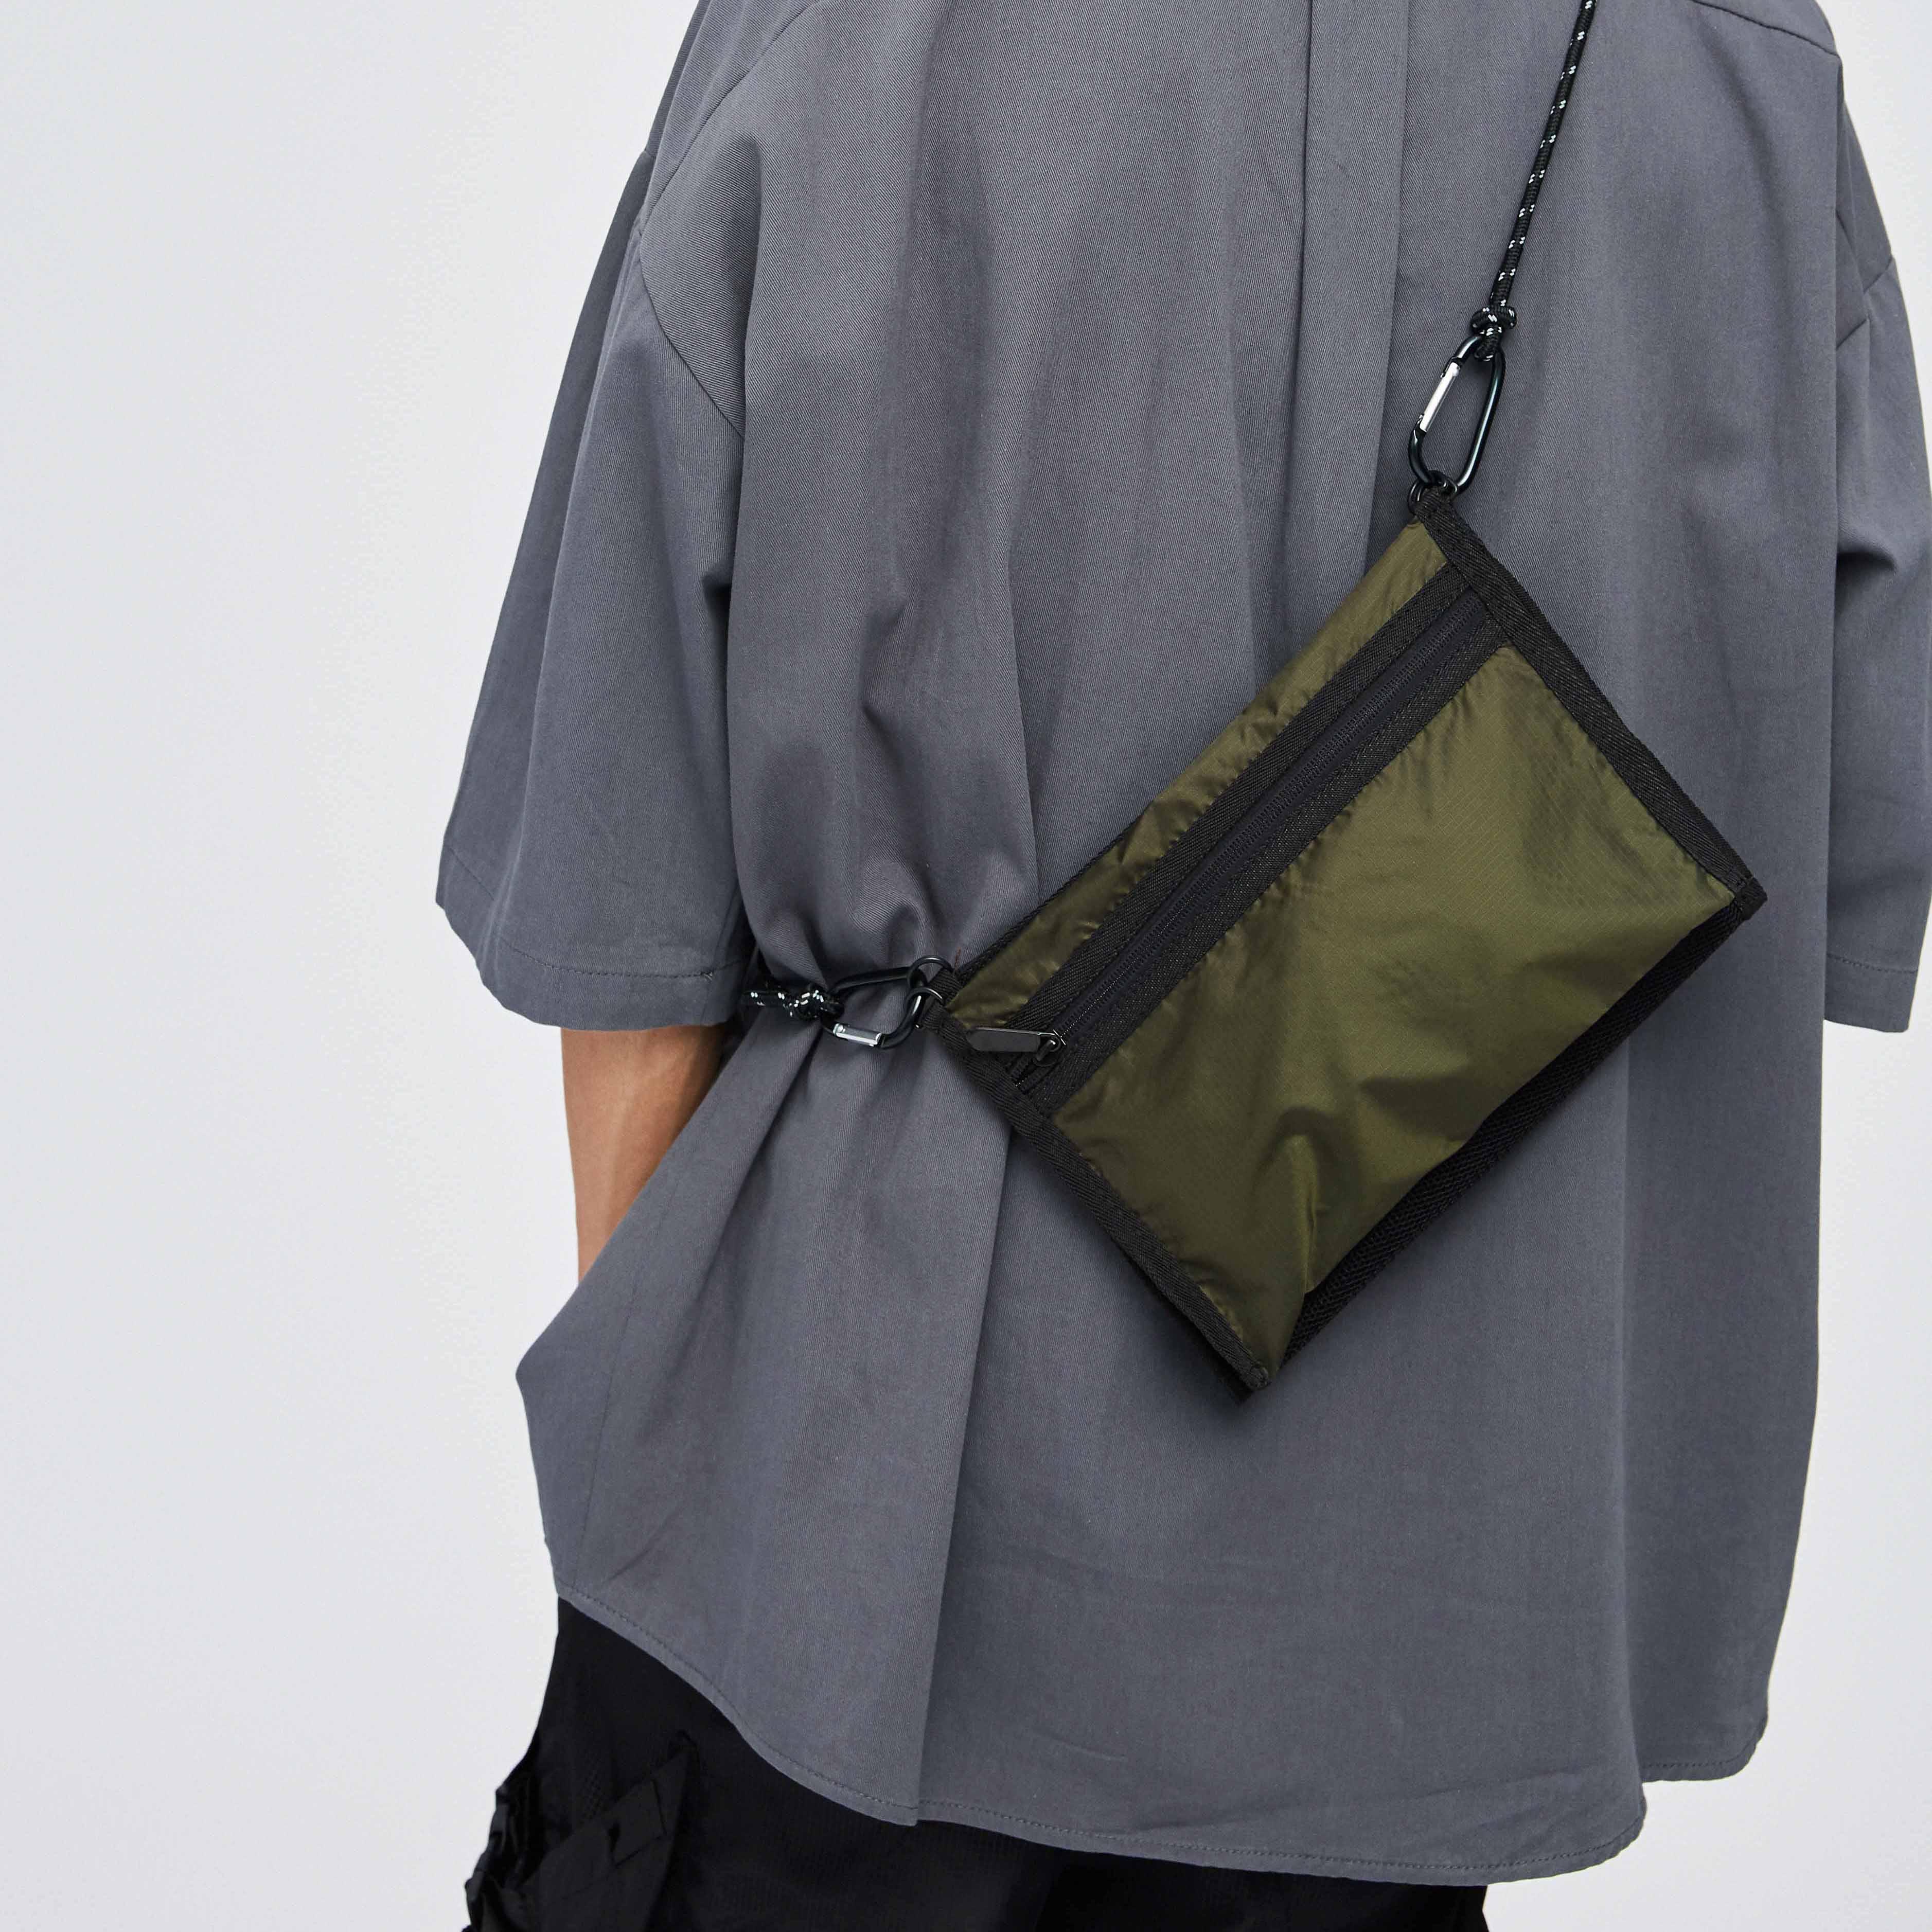 Assauit Street retro 3M reflective bag one shoulder straddle sports thundertide brand bungee bag